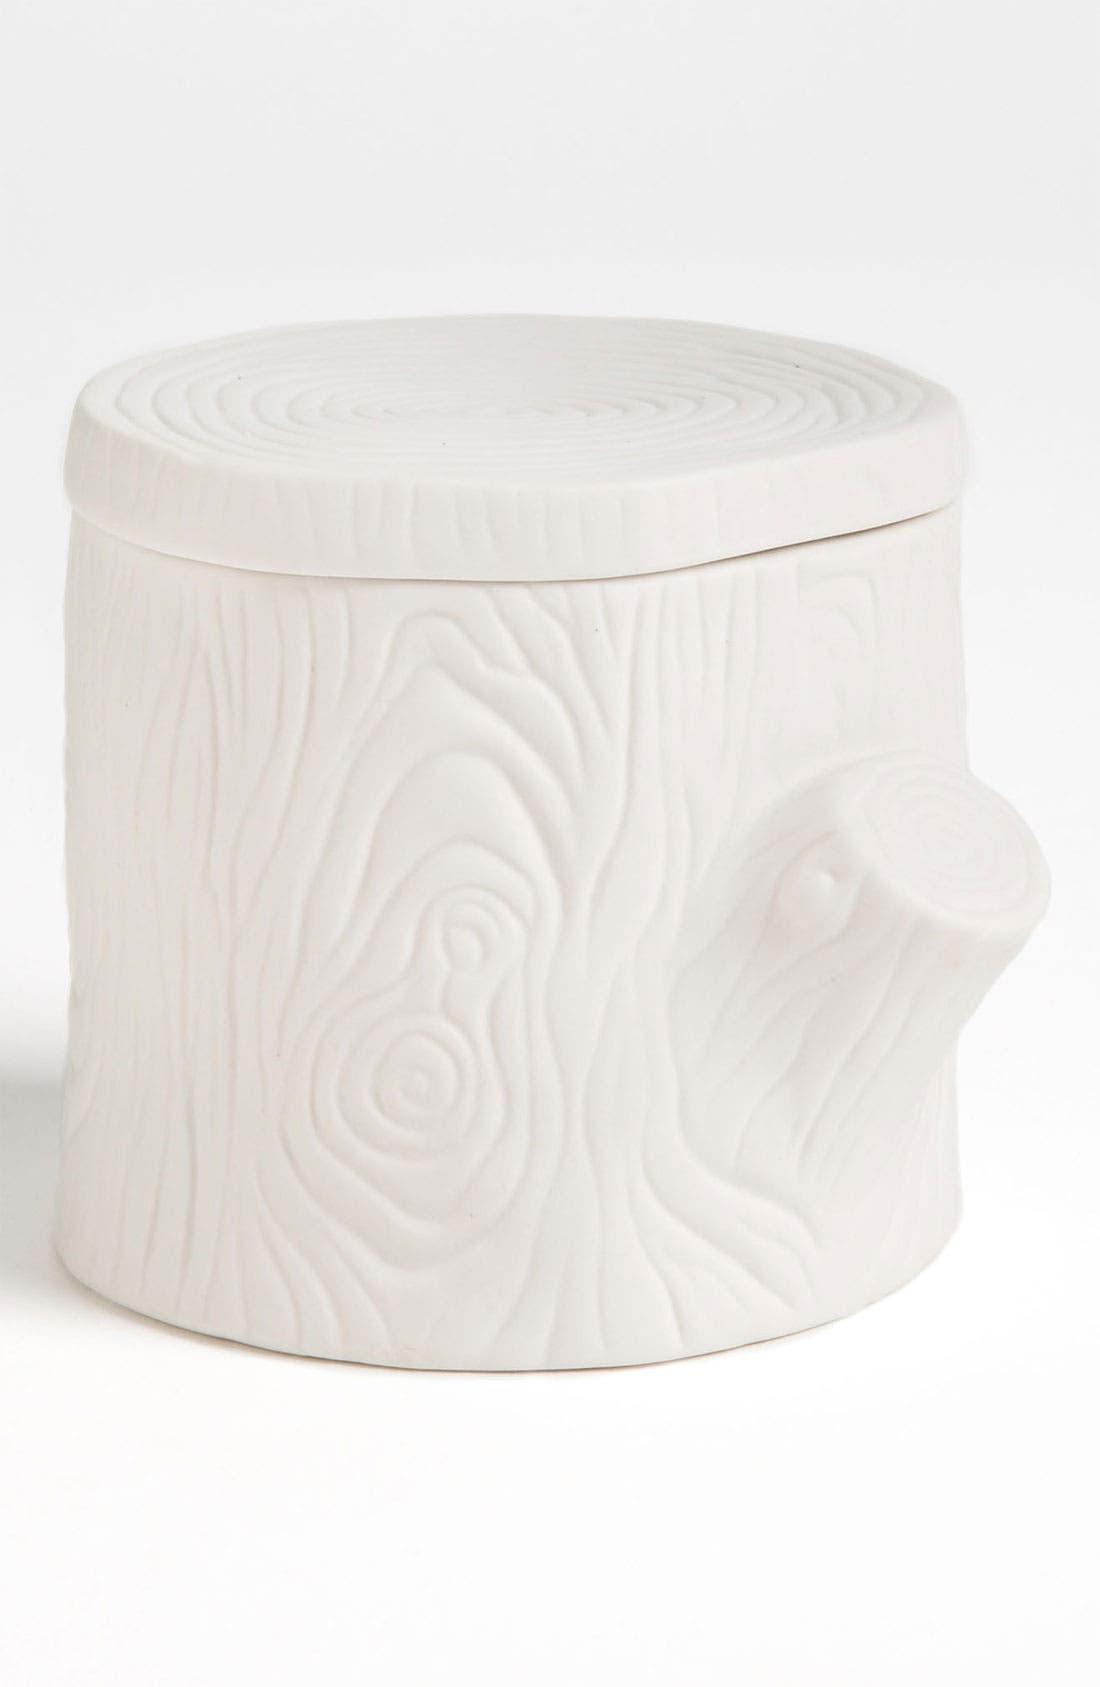 Main Image - 'Junk in The Trunk' Ceramic Box